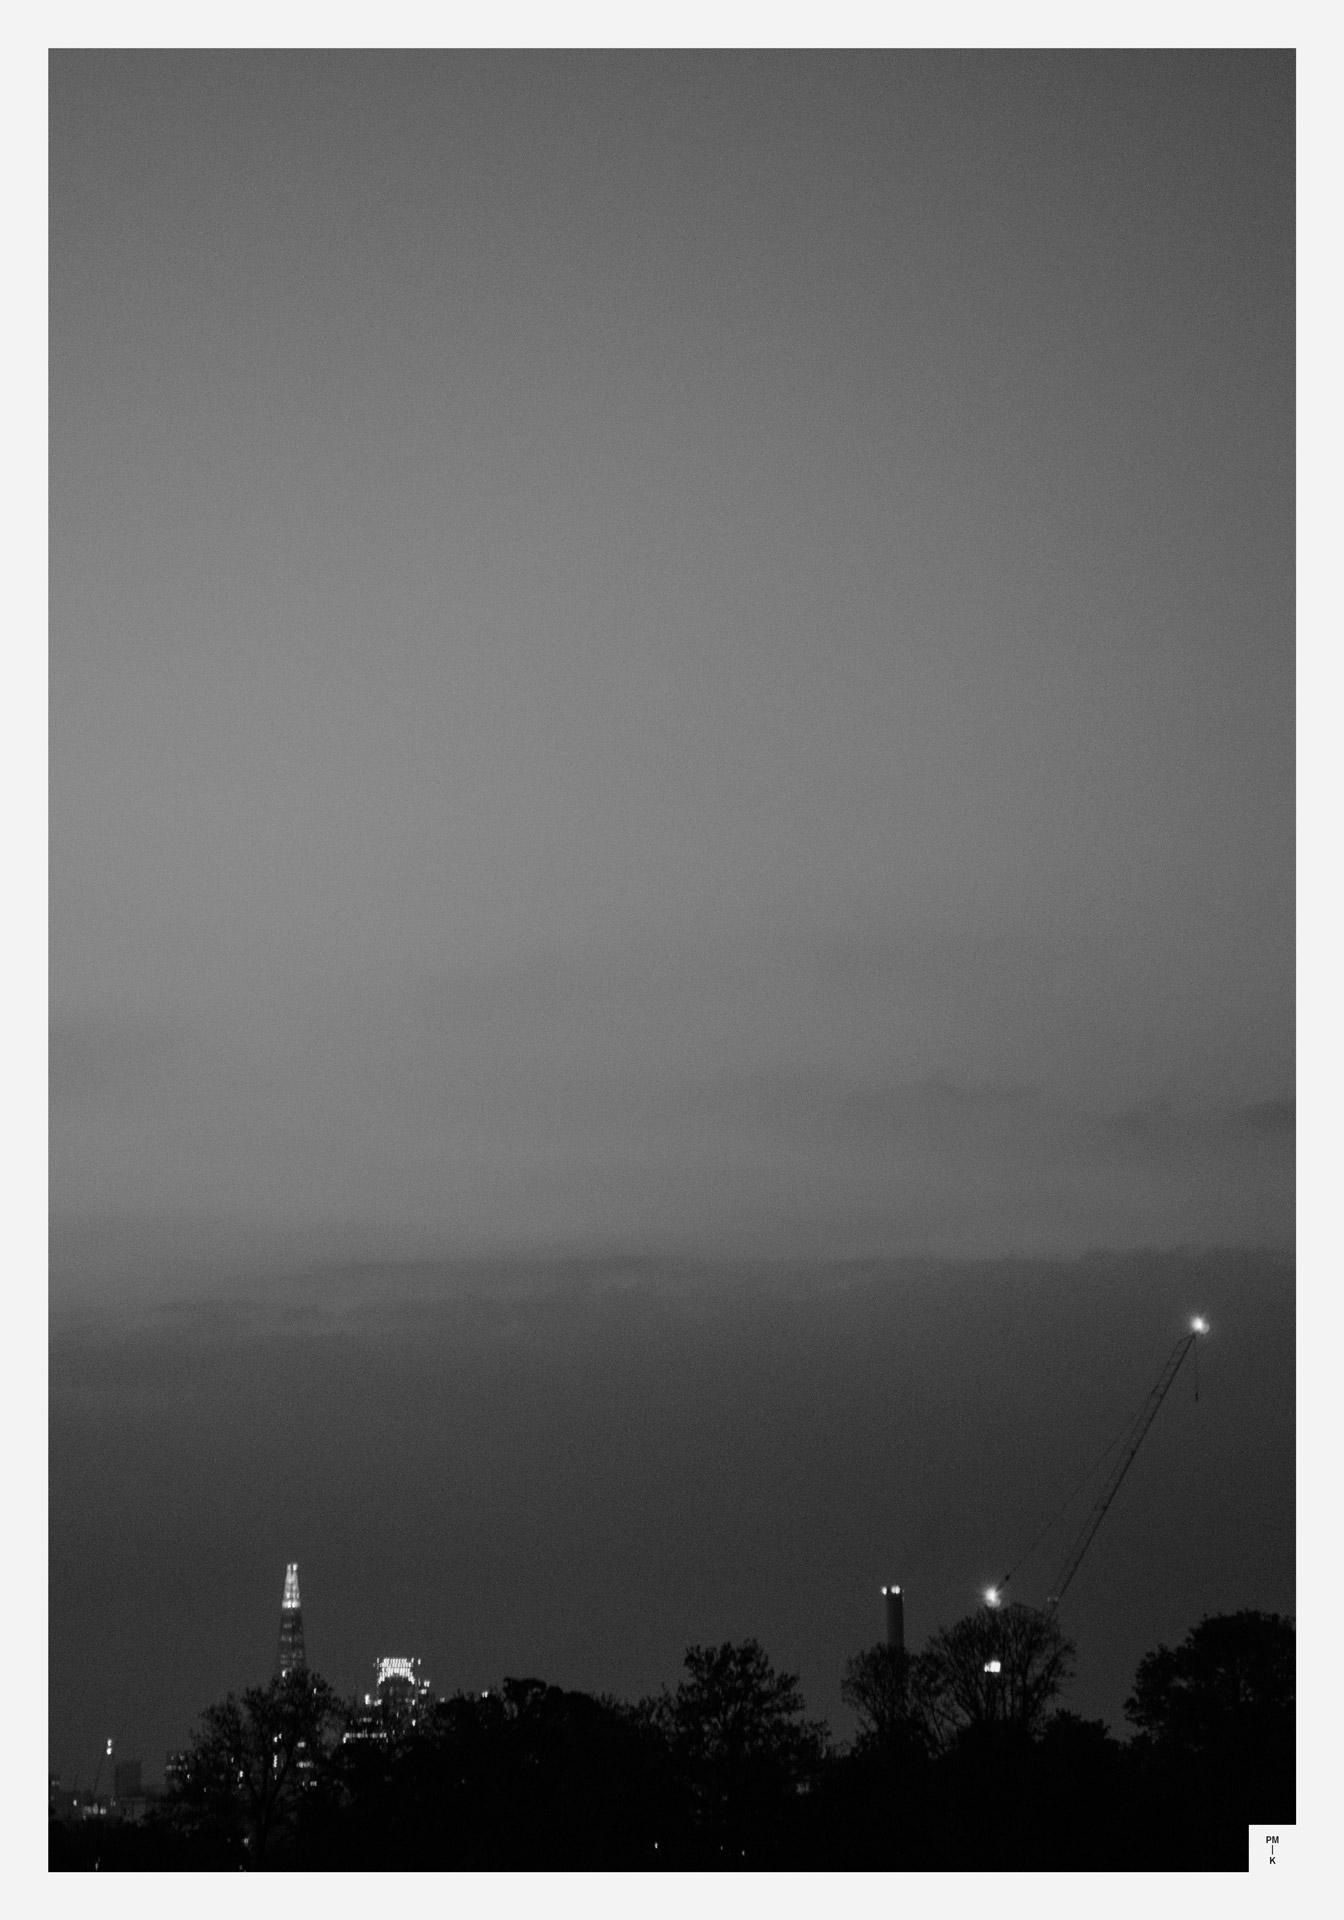 Tino Seubert - The Colour of Air - PM-K Print